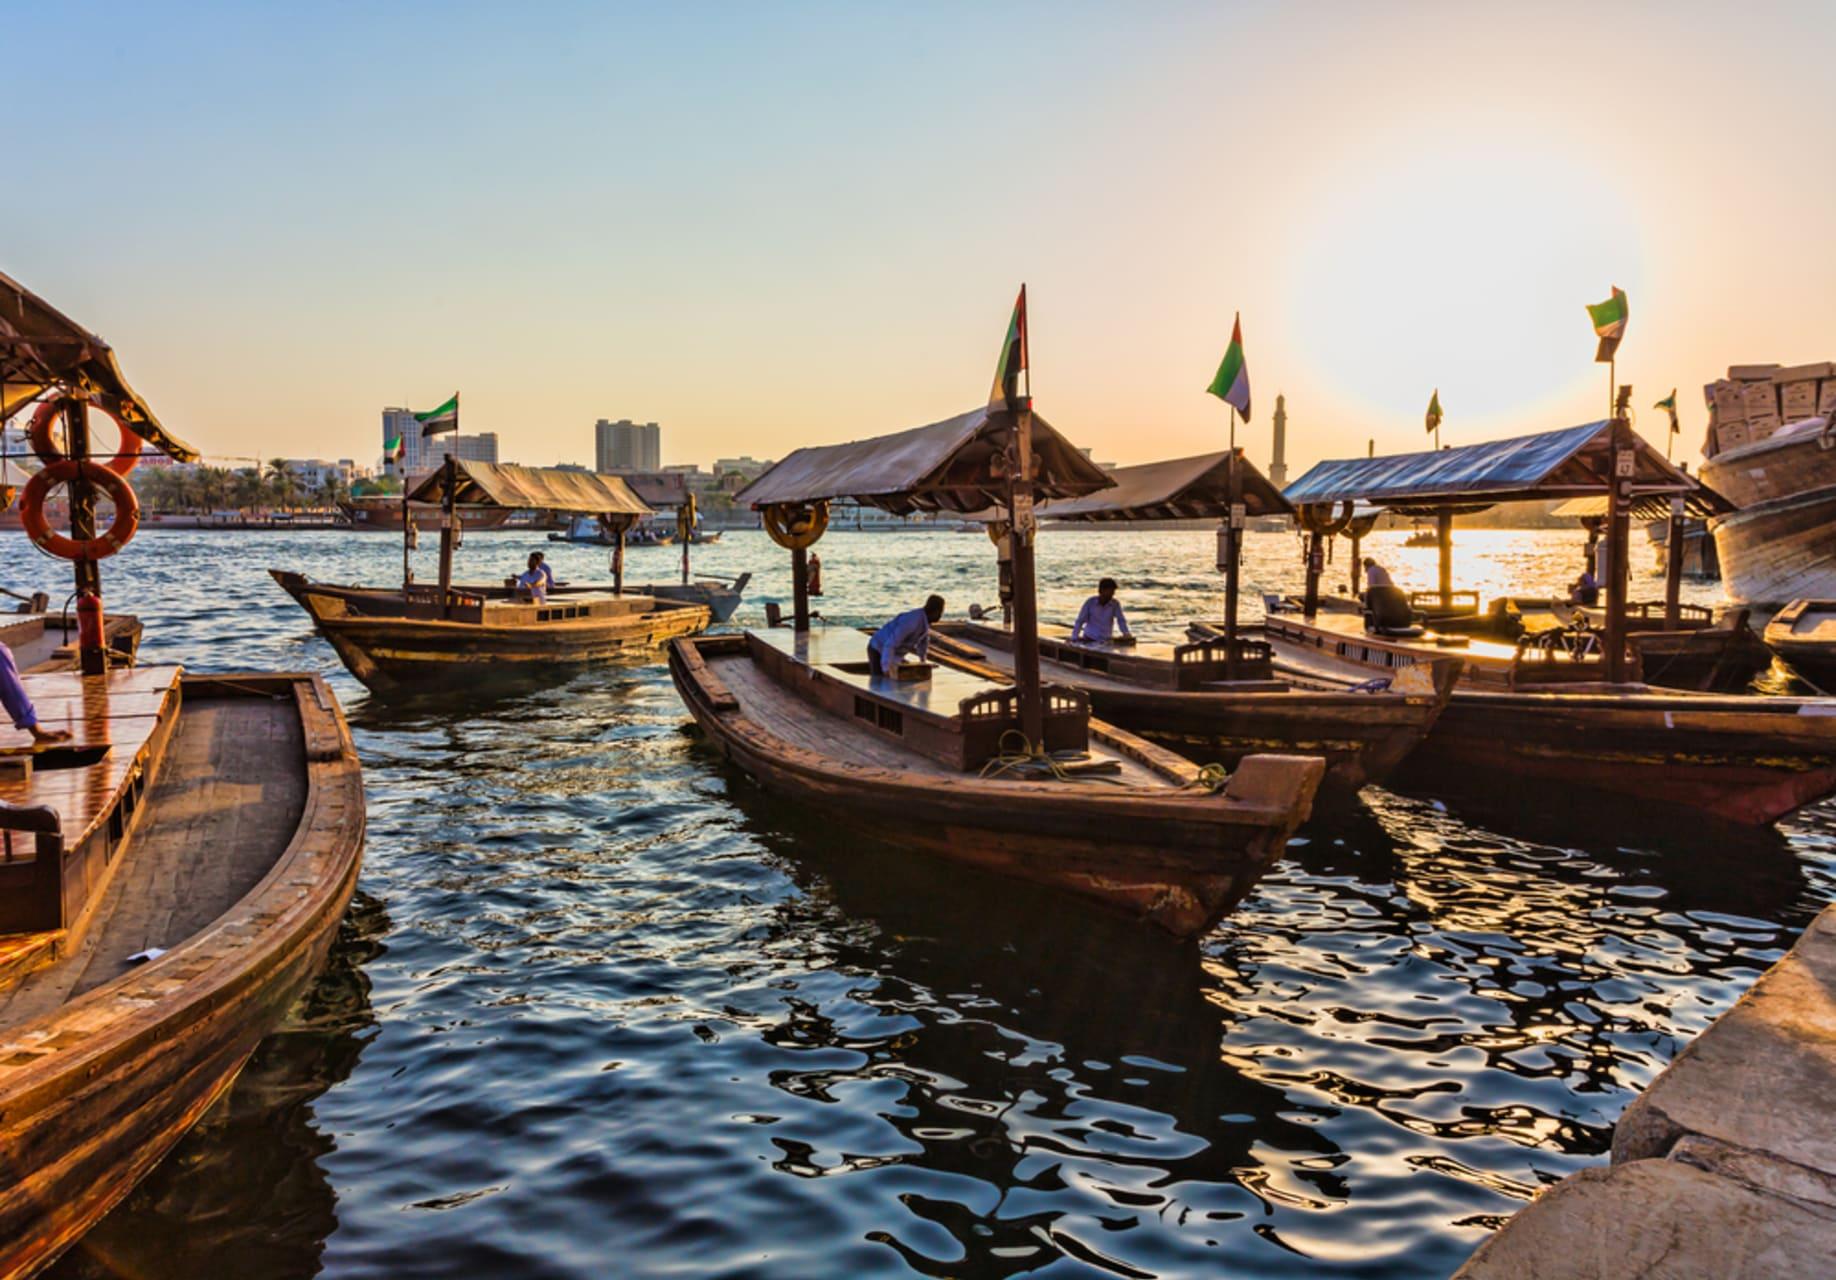 Dubai - Abra Crossing and Walk Through Alseef Heritage City